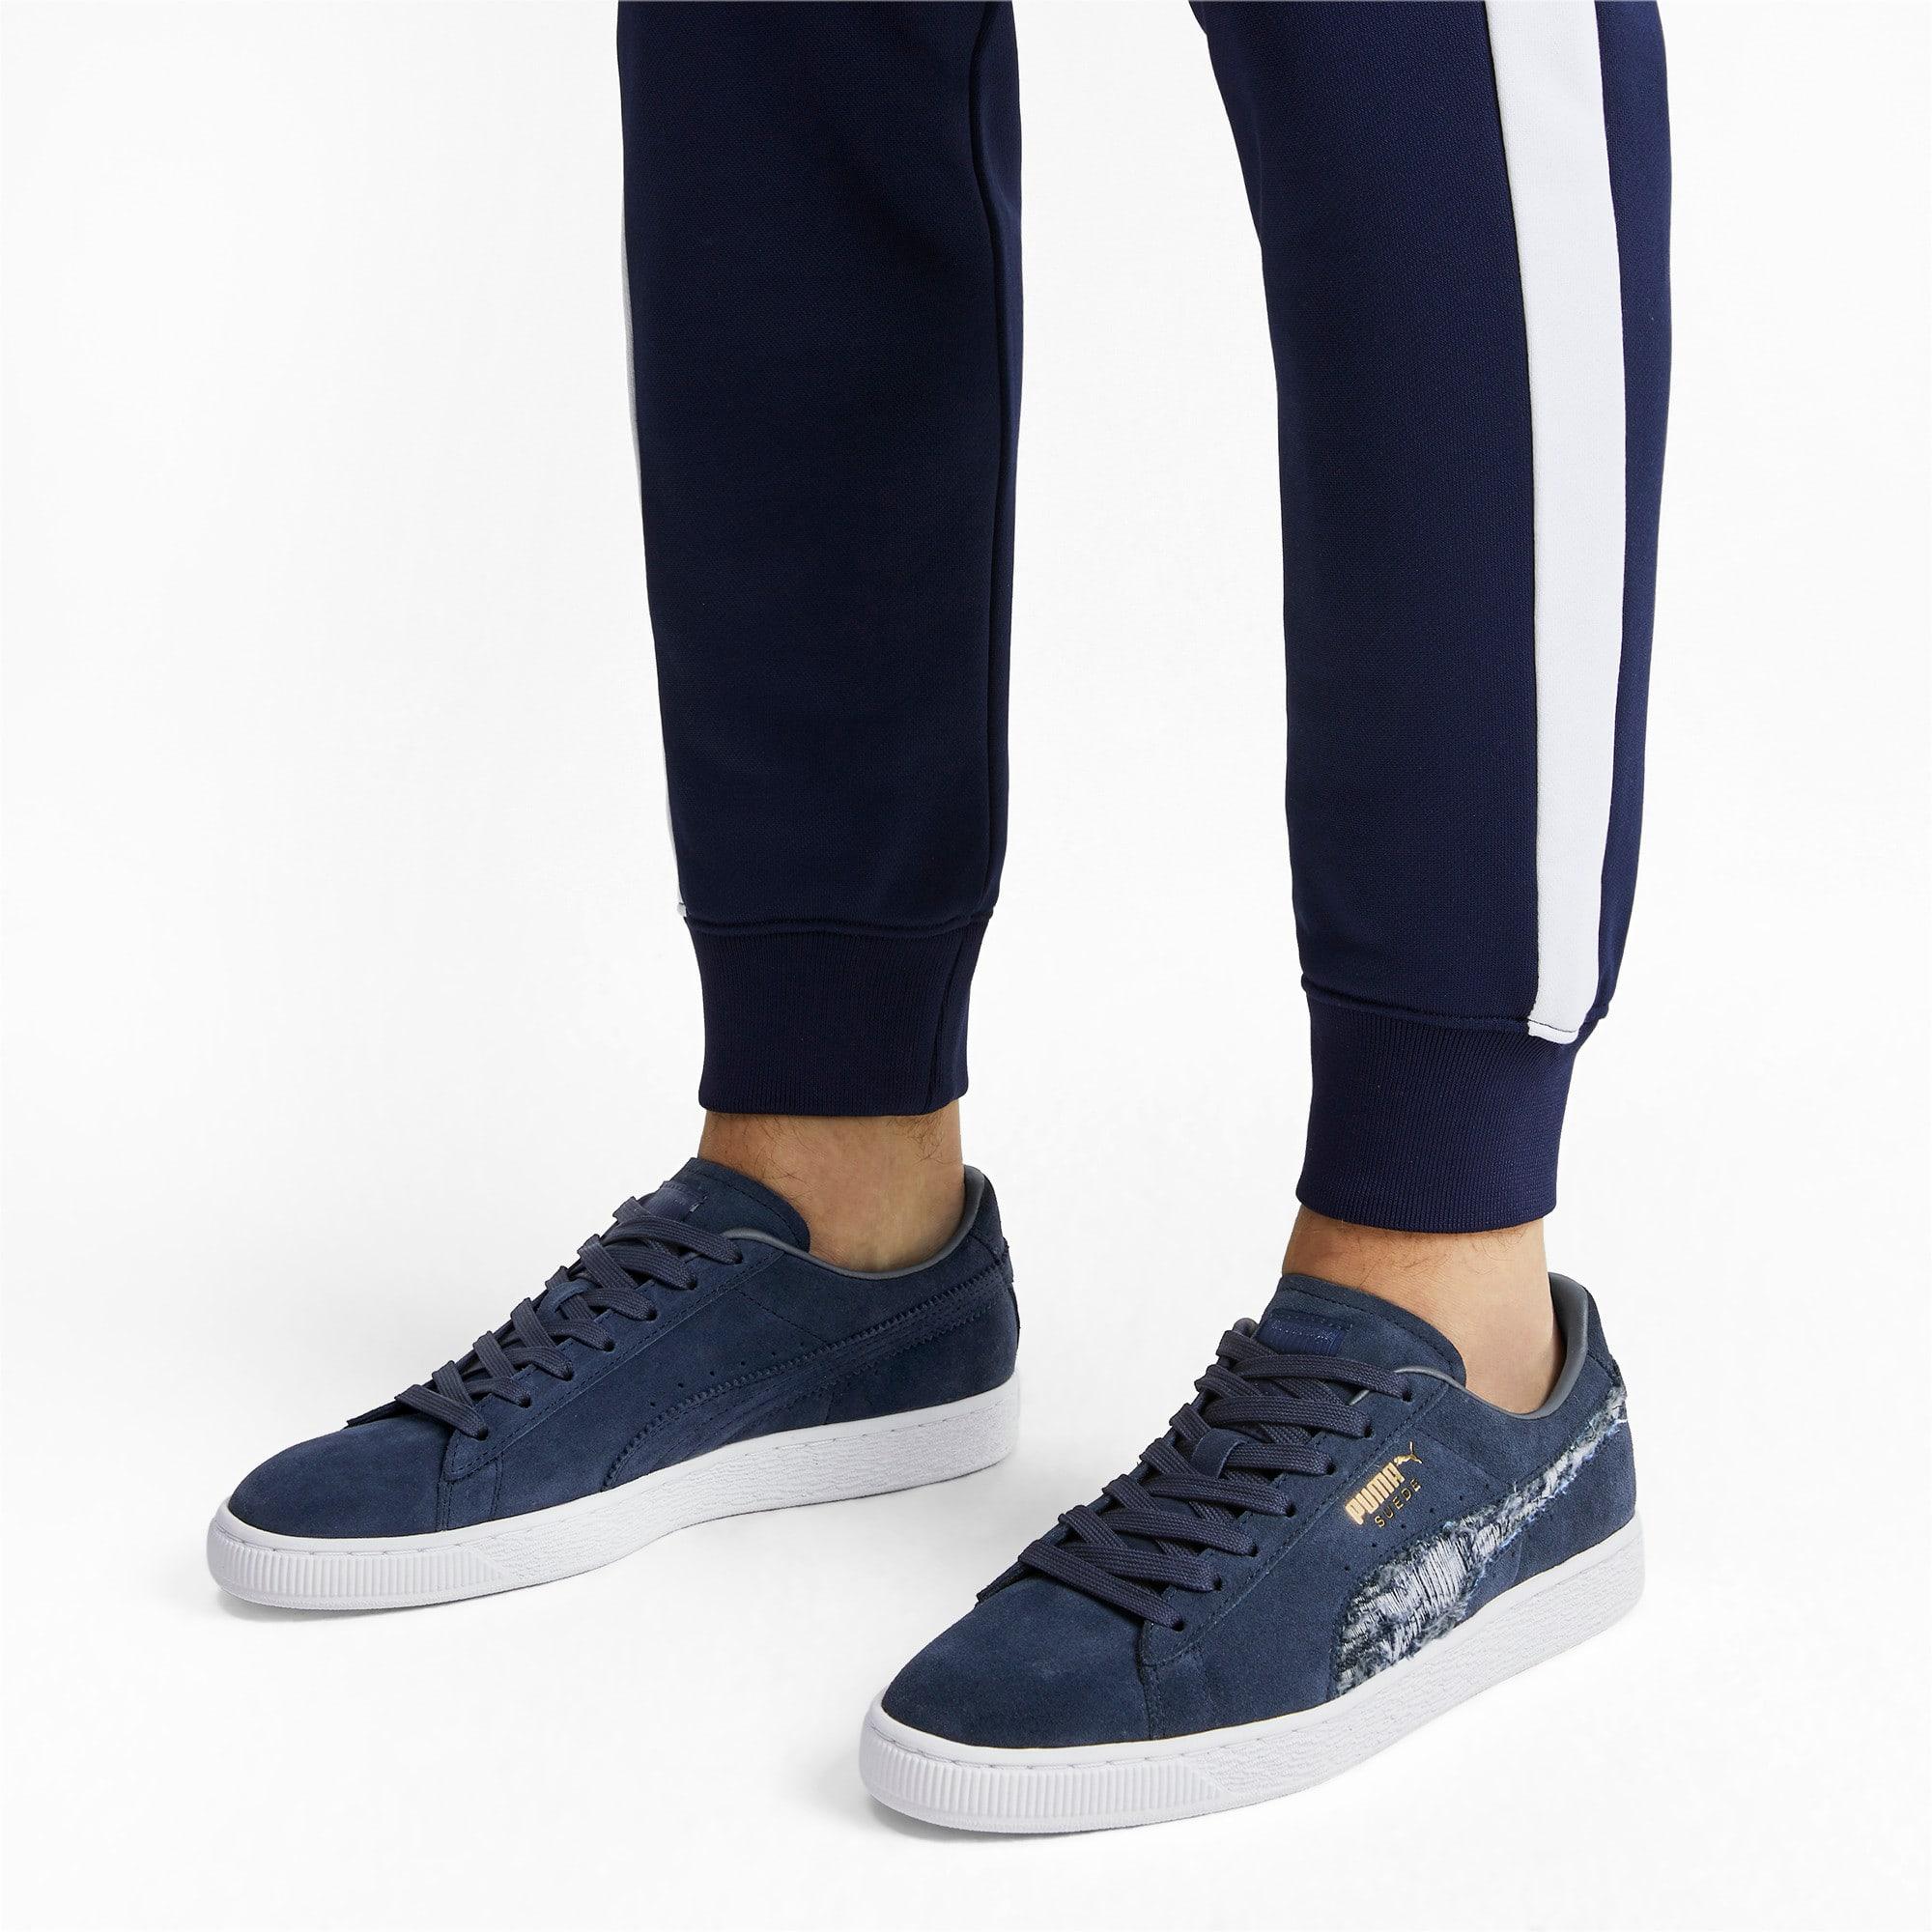 Thumbnail 3 of Suede Ripped Denim Sneakers, Peacoat-Peacoat-Puma White, medium